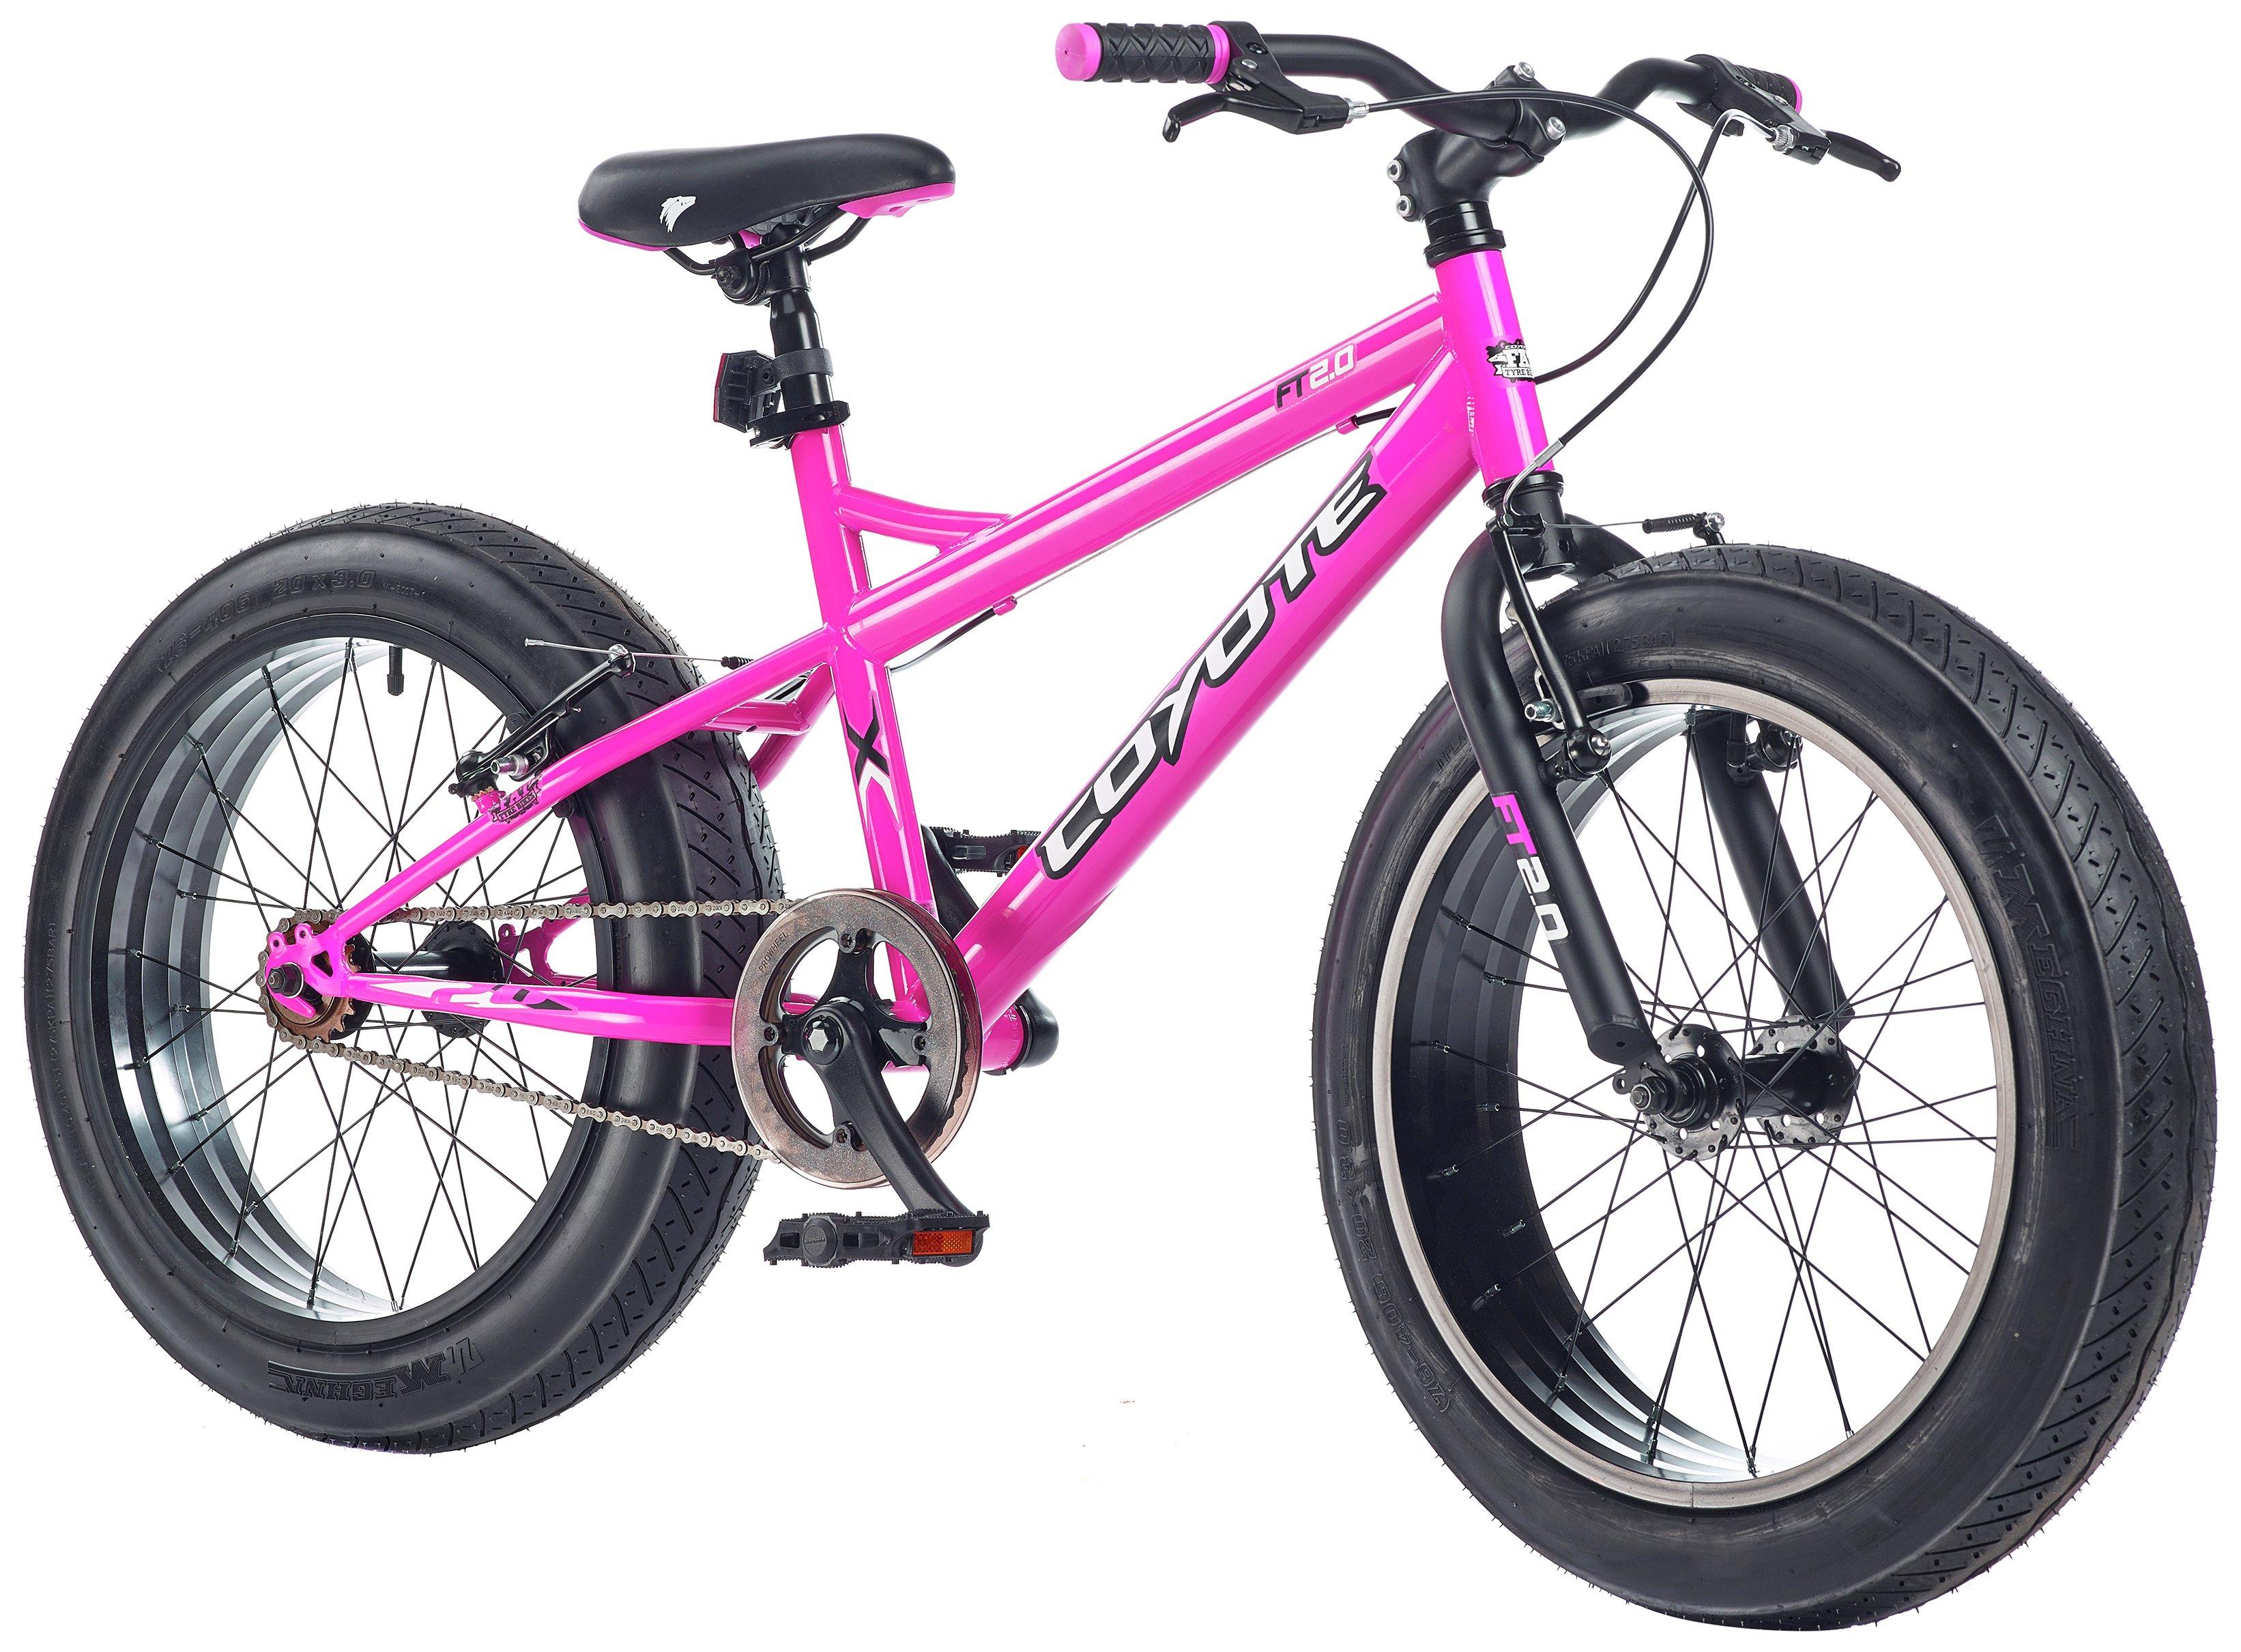 Image of Coyote - Fatman 14 Inch All Terrain - Bike - Neon Pink